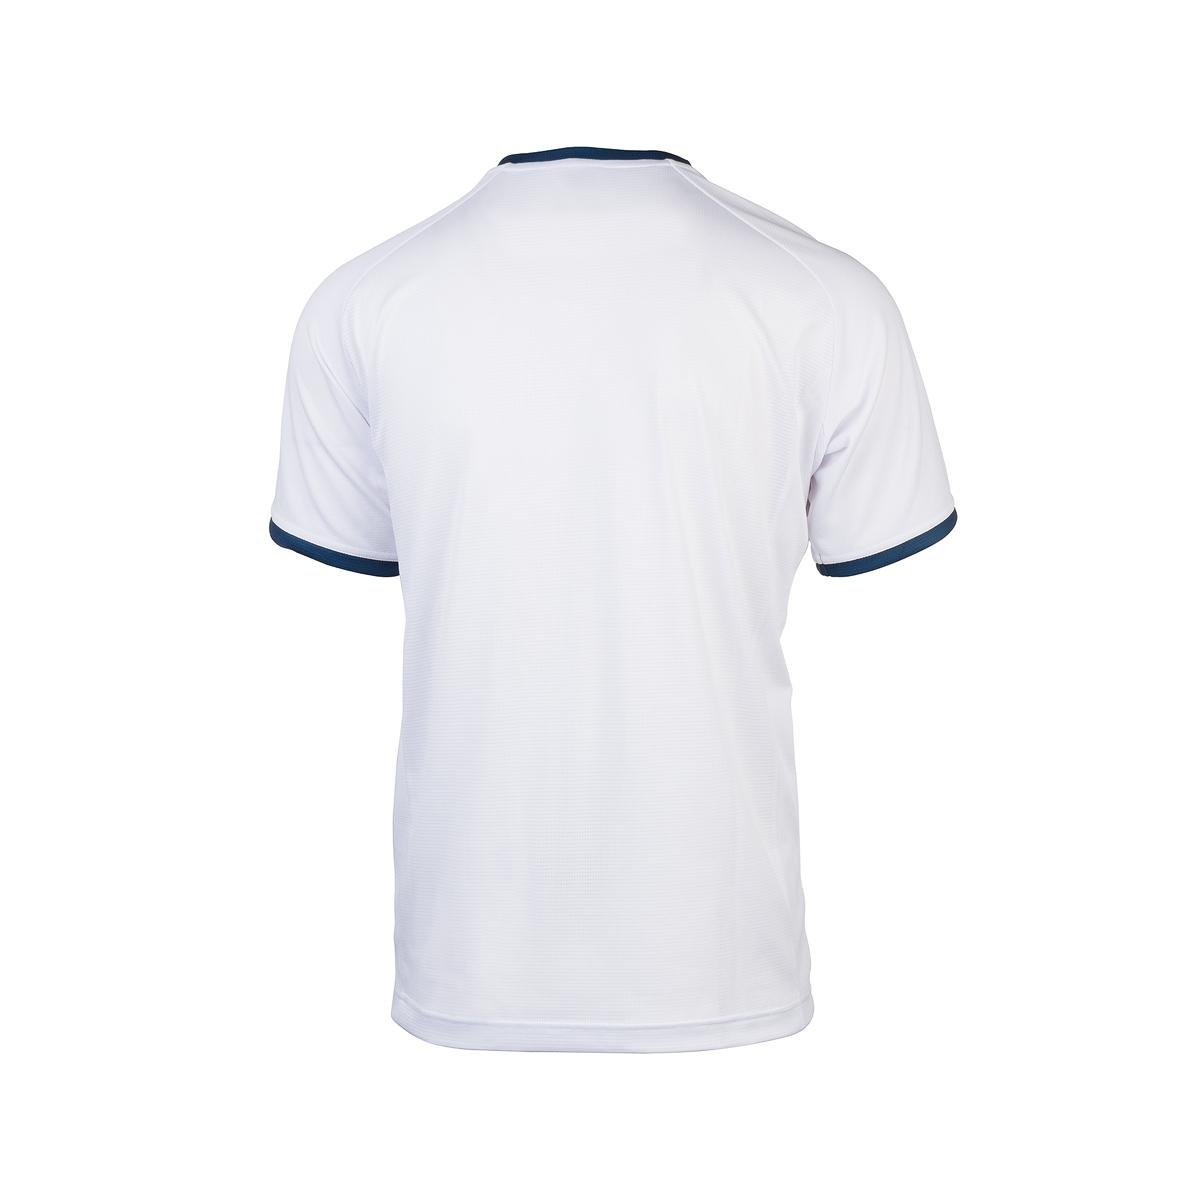 Men's Crew Neck Shirt Badminton TournamentDetailbild - 3